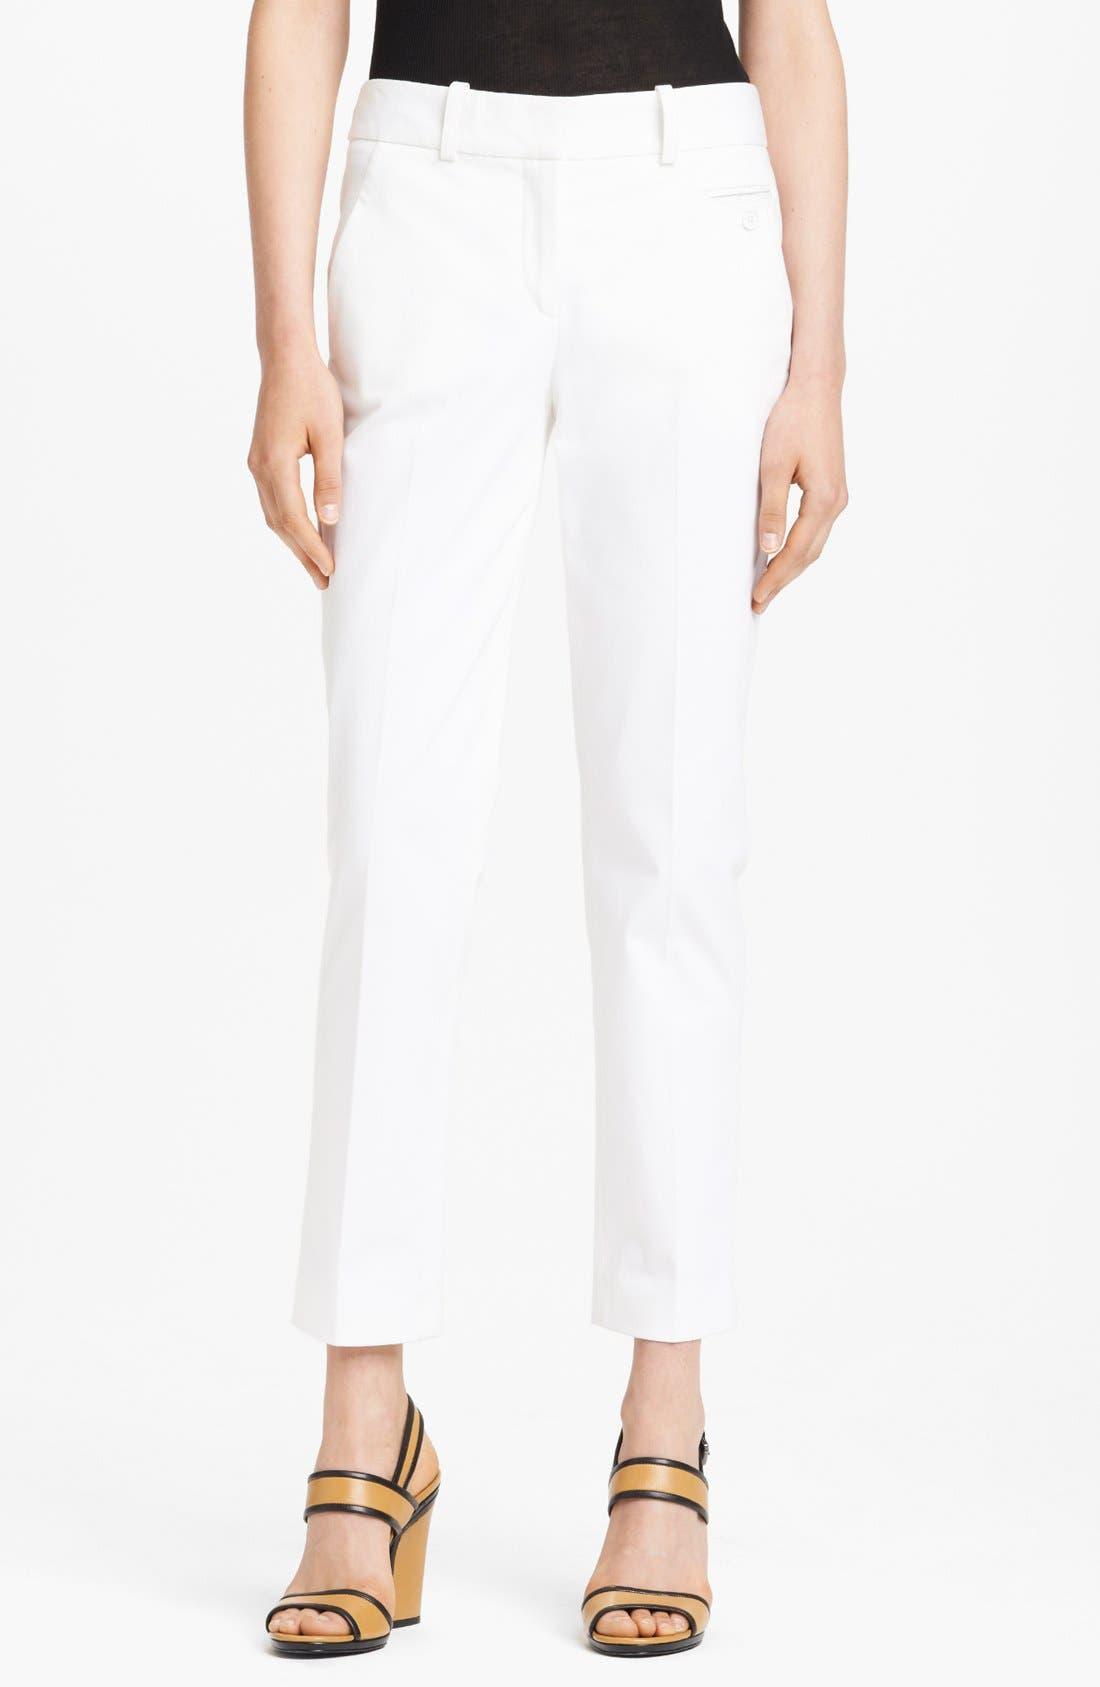 Alternate Image 1 Selected - Michael Kors 'Samantha' Skinny Sateen Pants